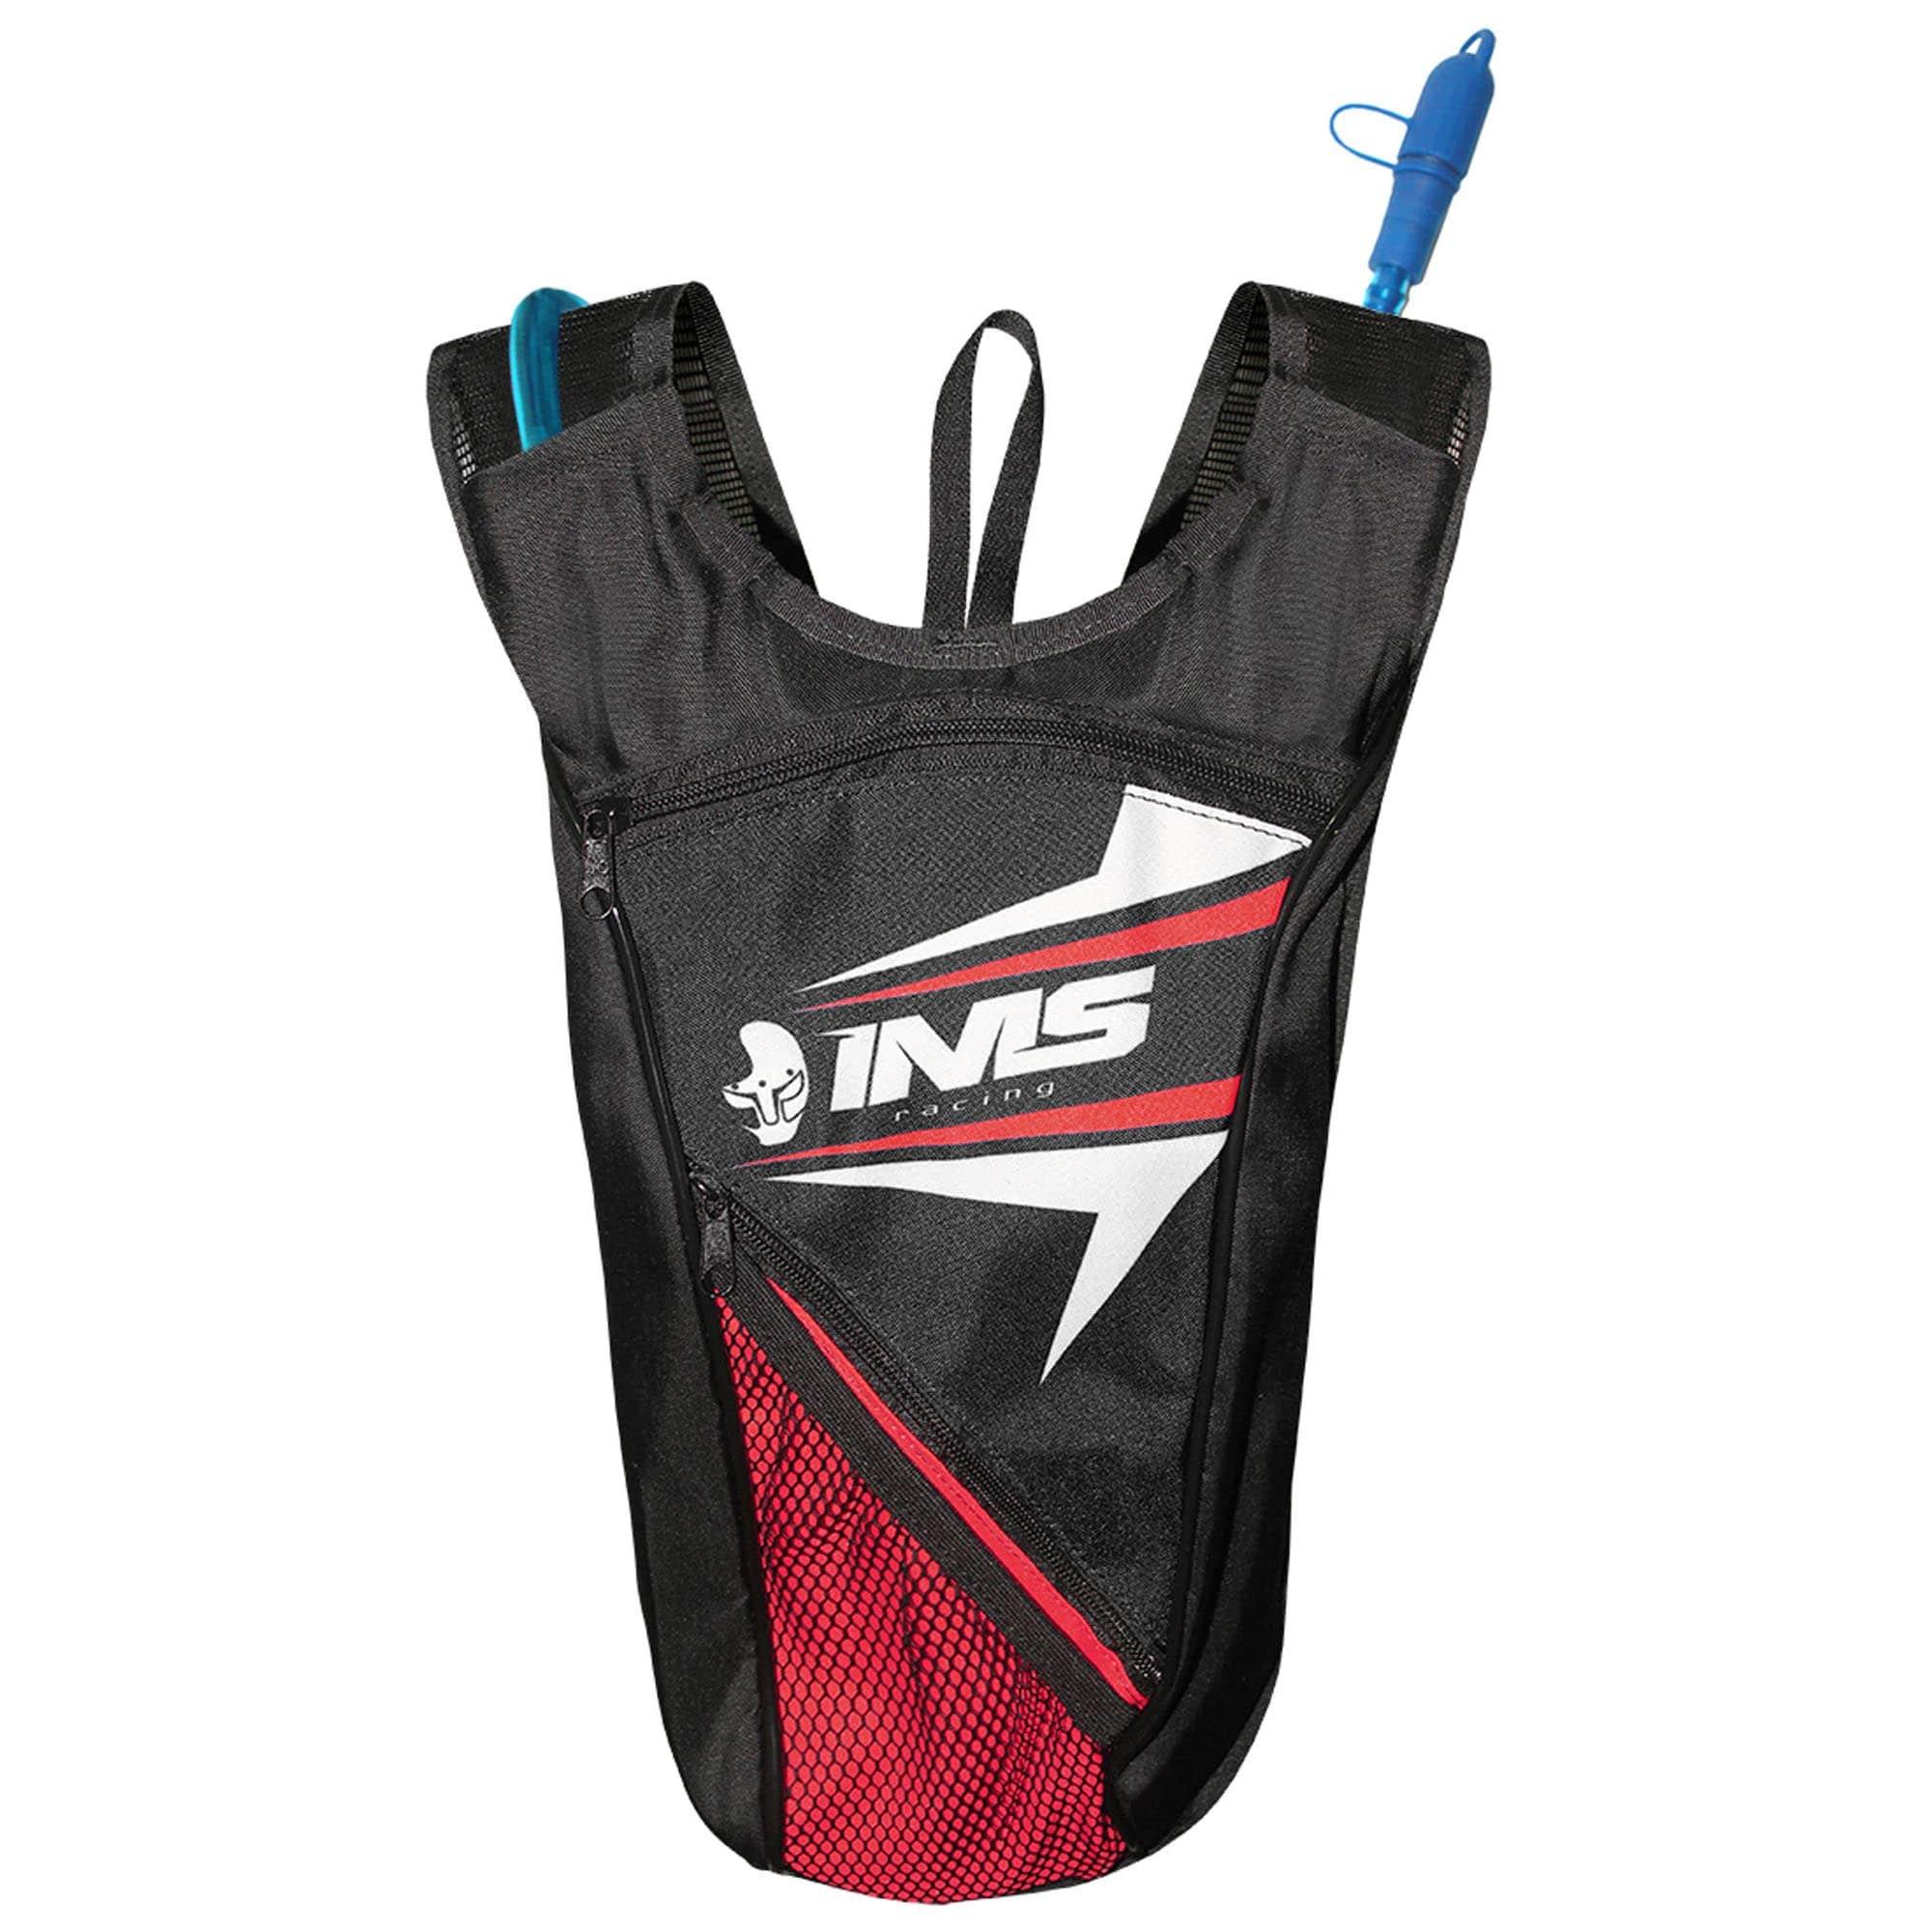 Mochila de Hidratação IMS Flex 2L  - HP Race Off Road